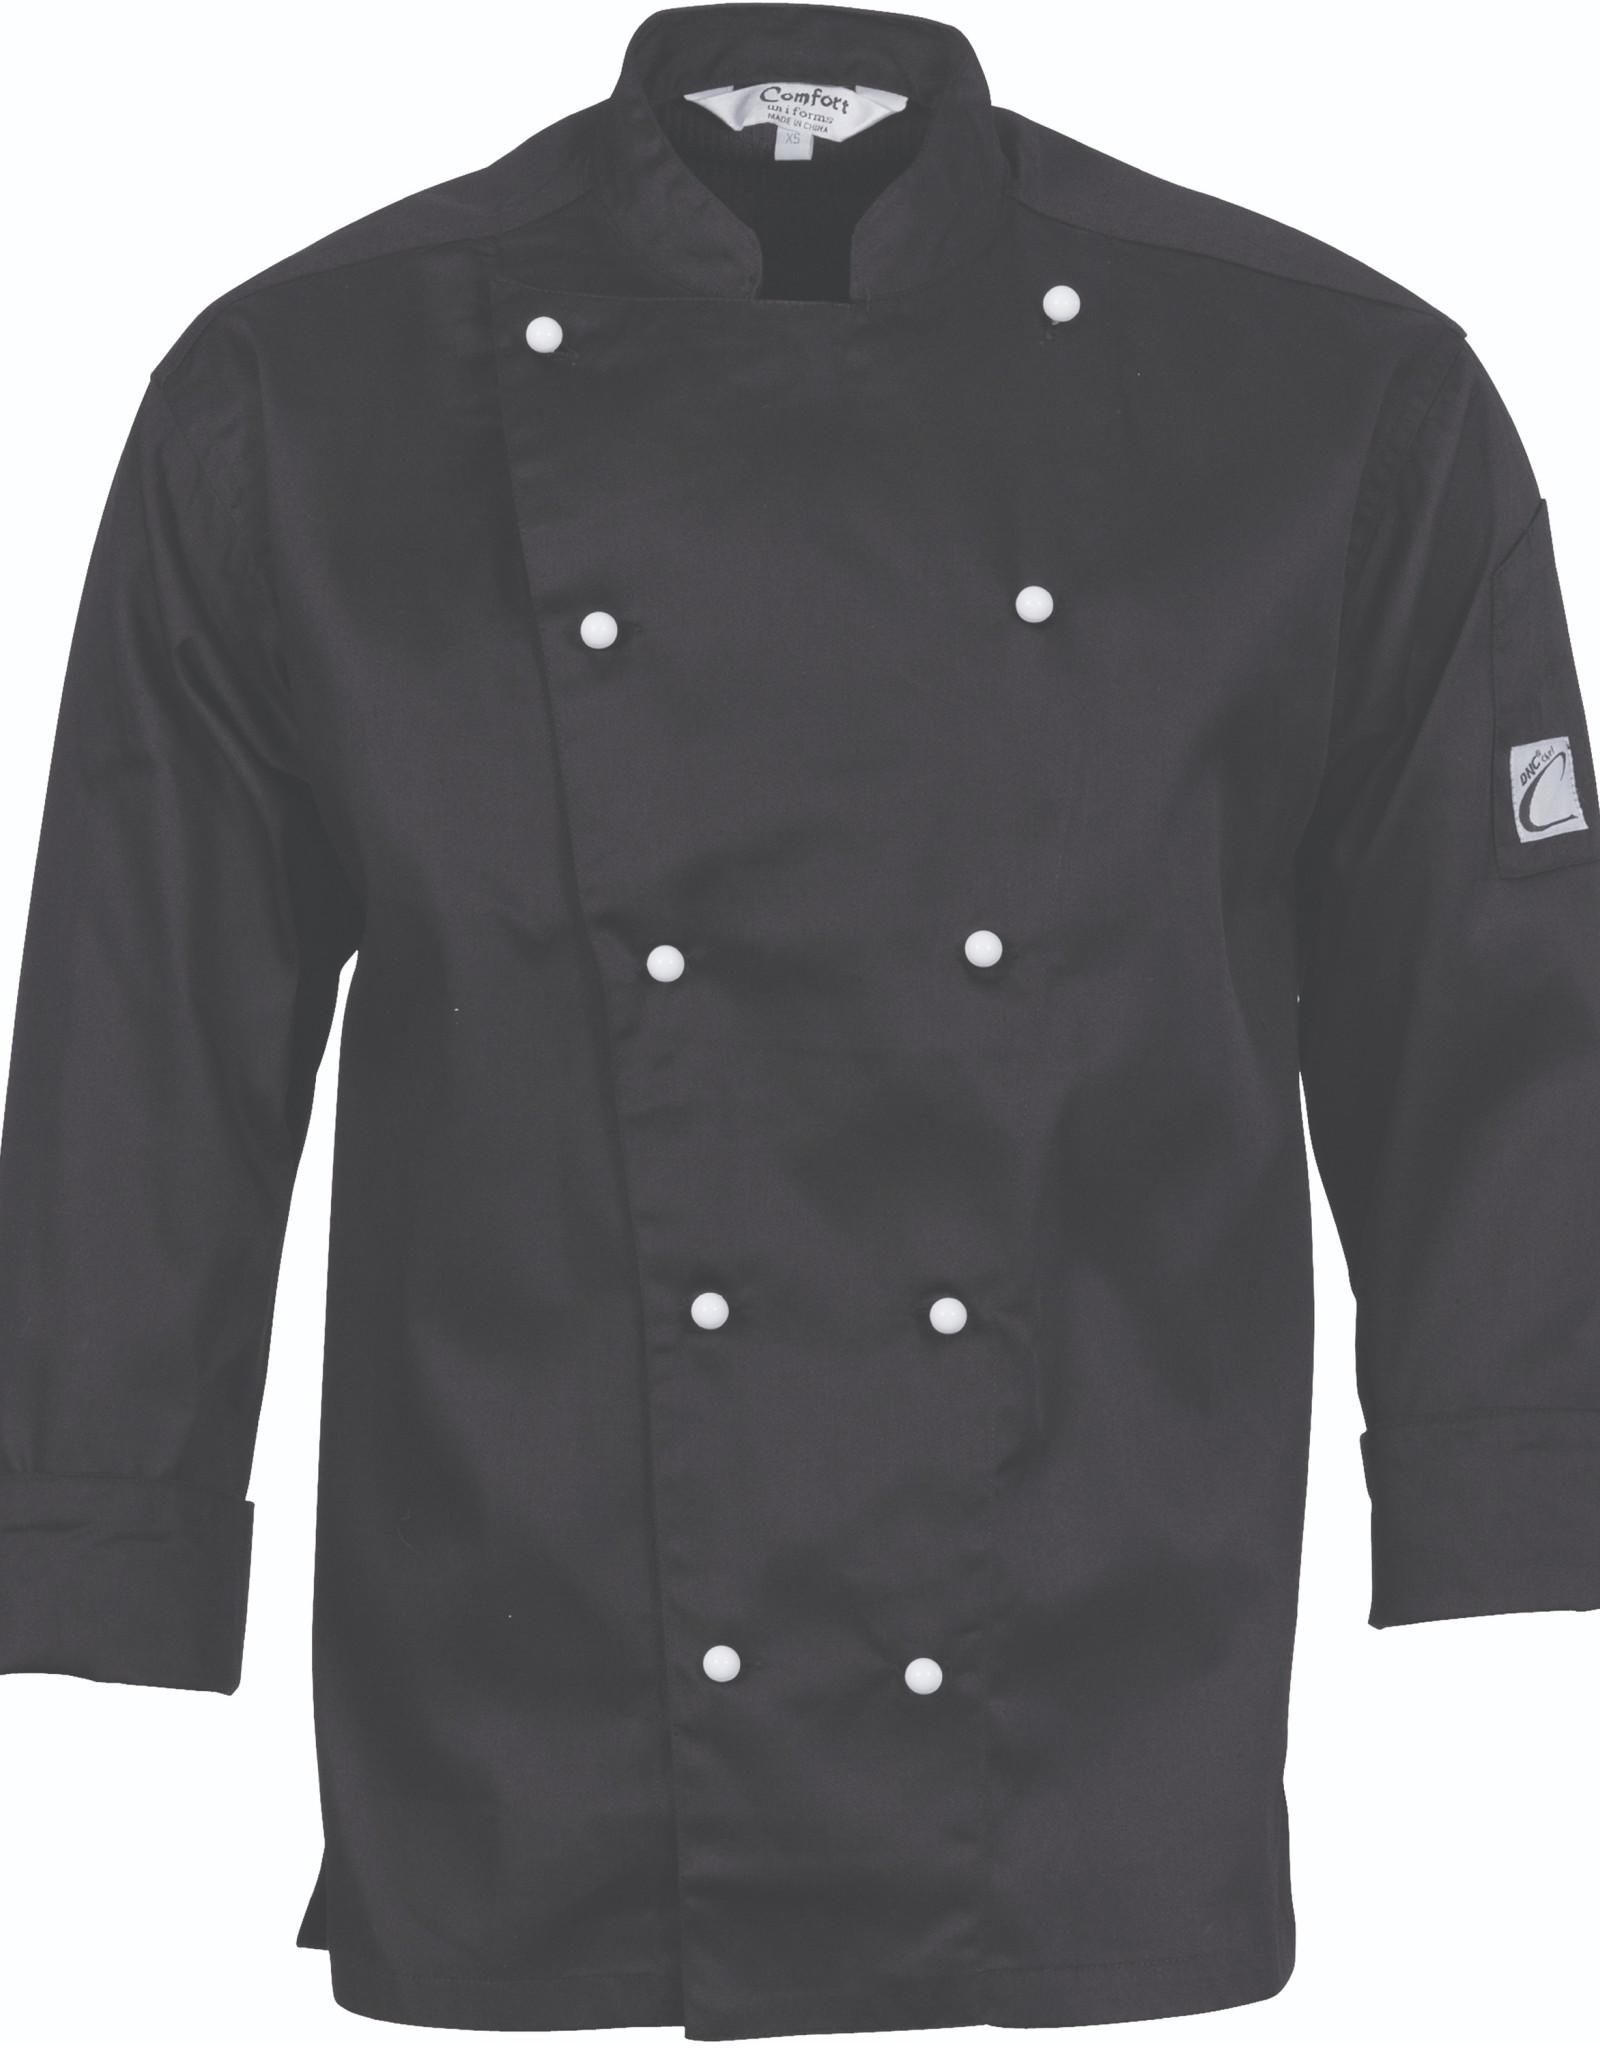 DNC Workwear DNC Traditional Long Sleeve Chefs Jacket